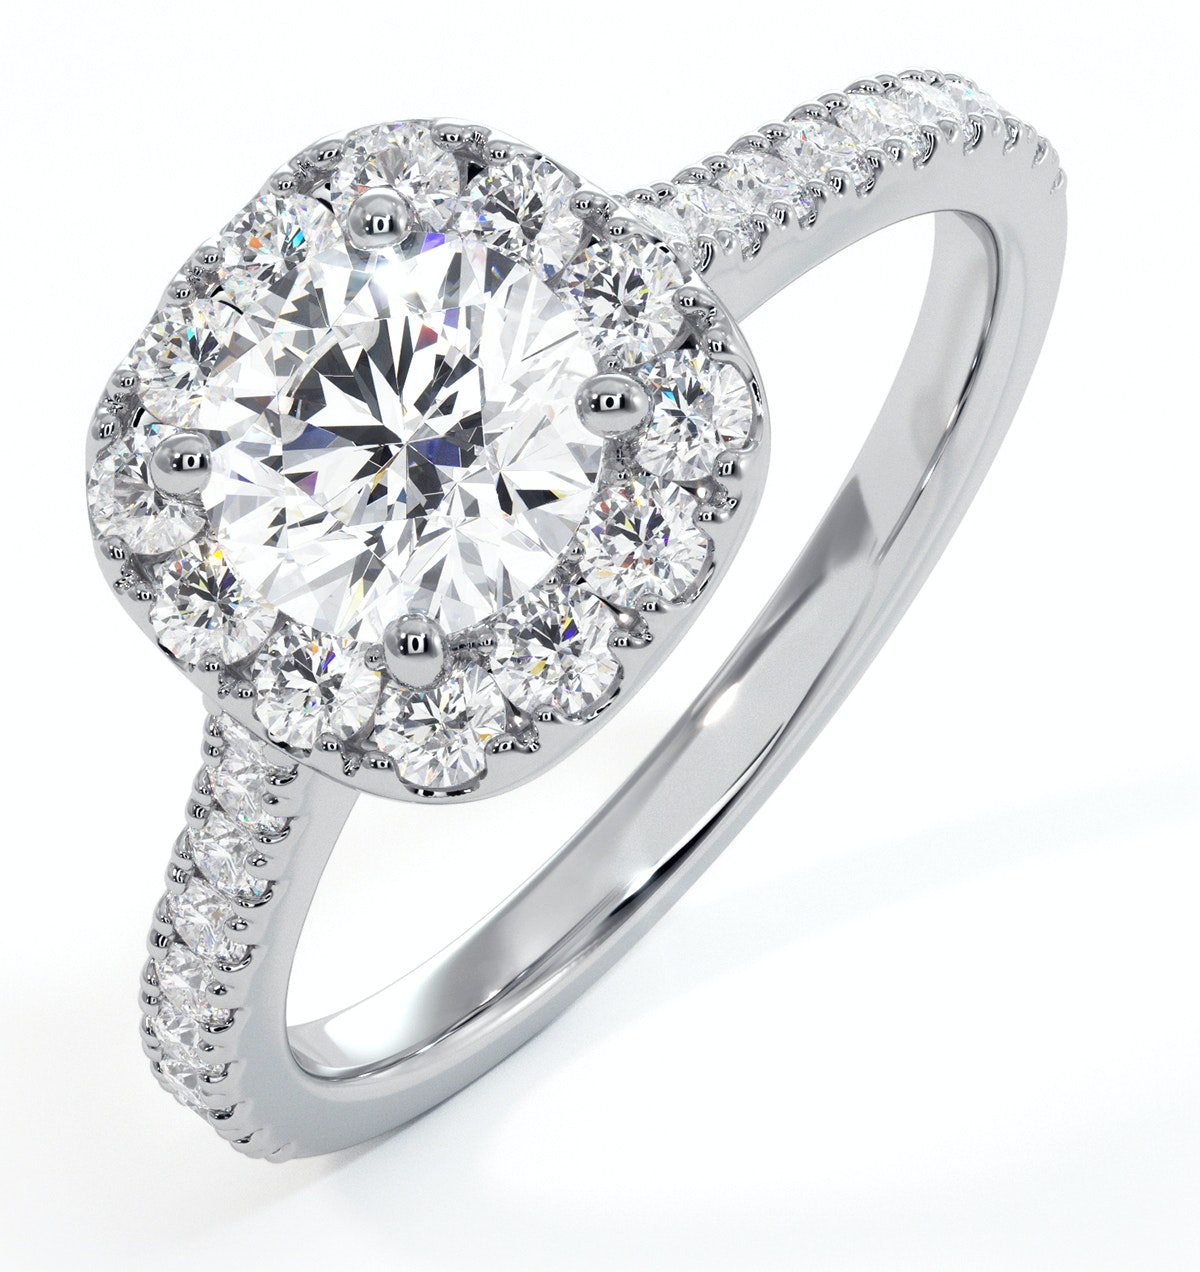 Elizabeth GIA Diamond Halo Engagement Ring in Platinum 1.30ct G/SI2